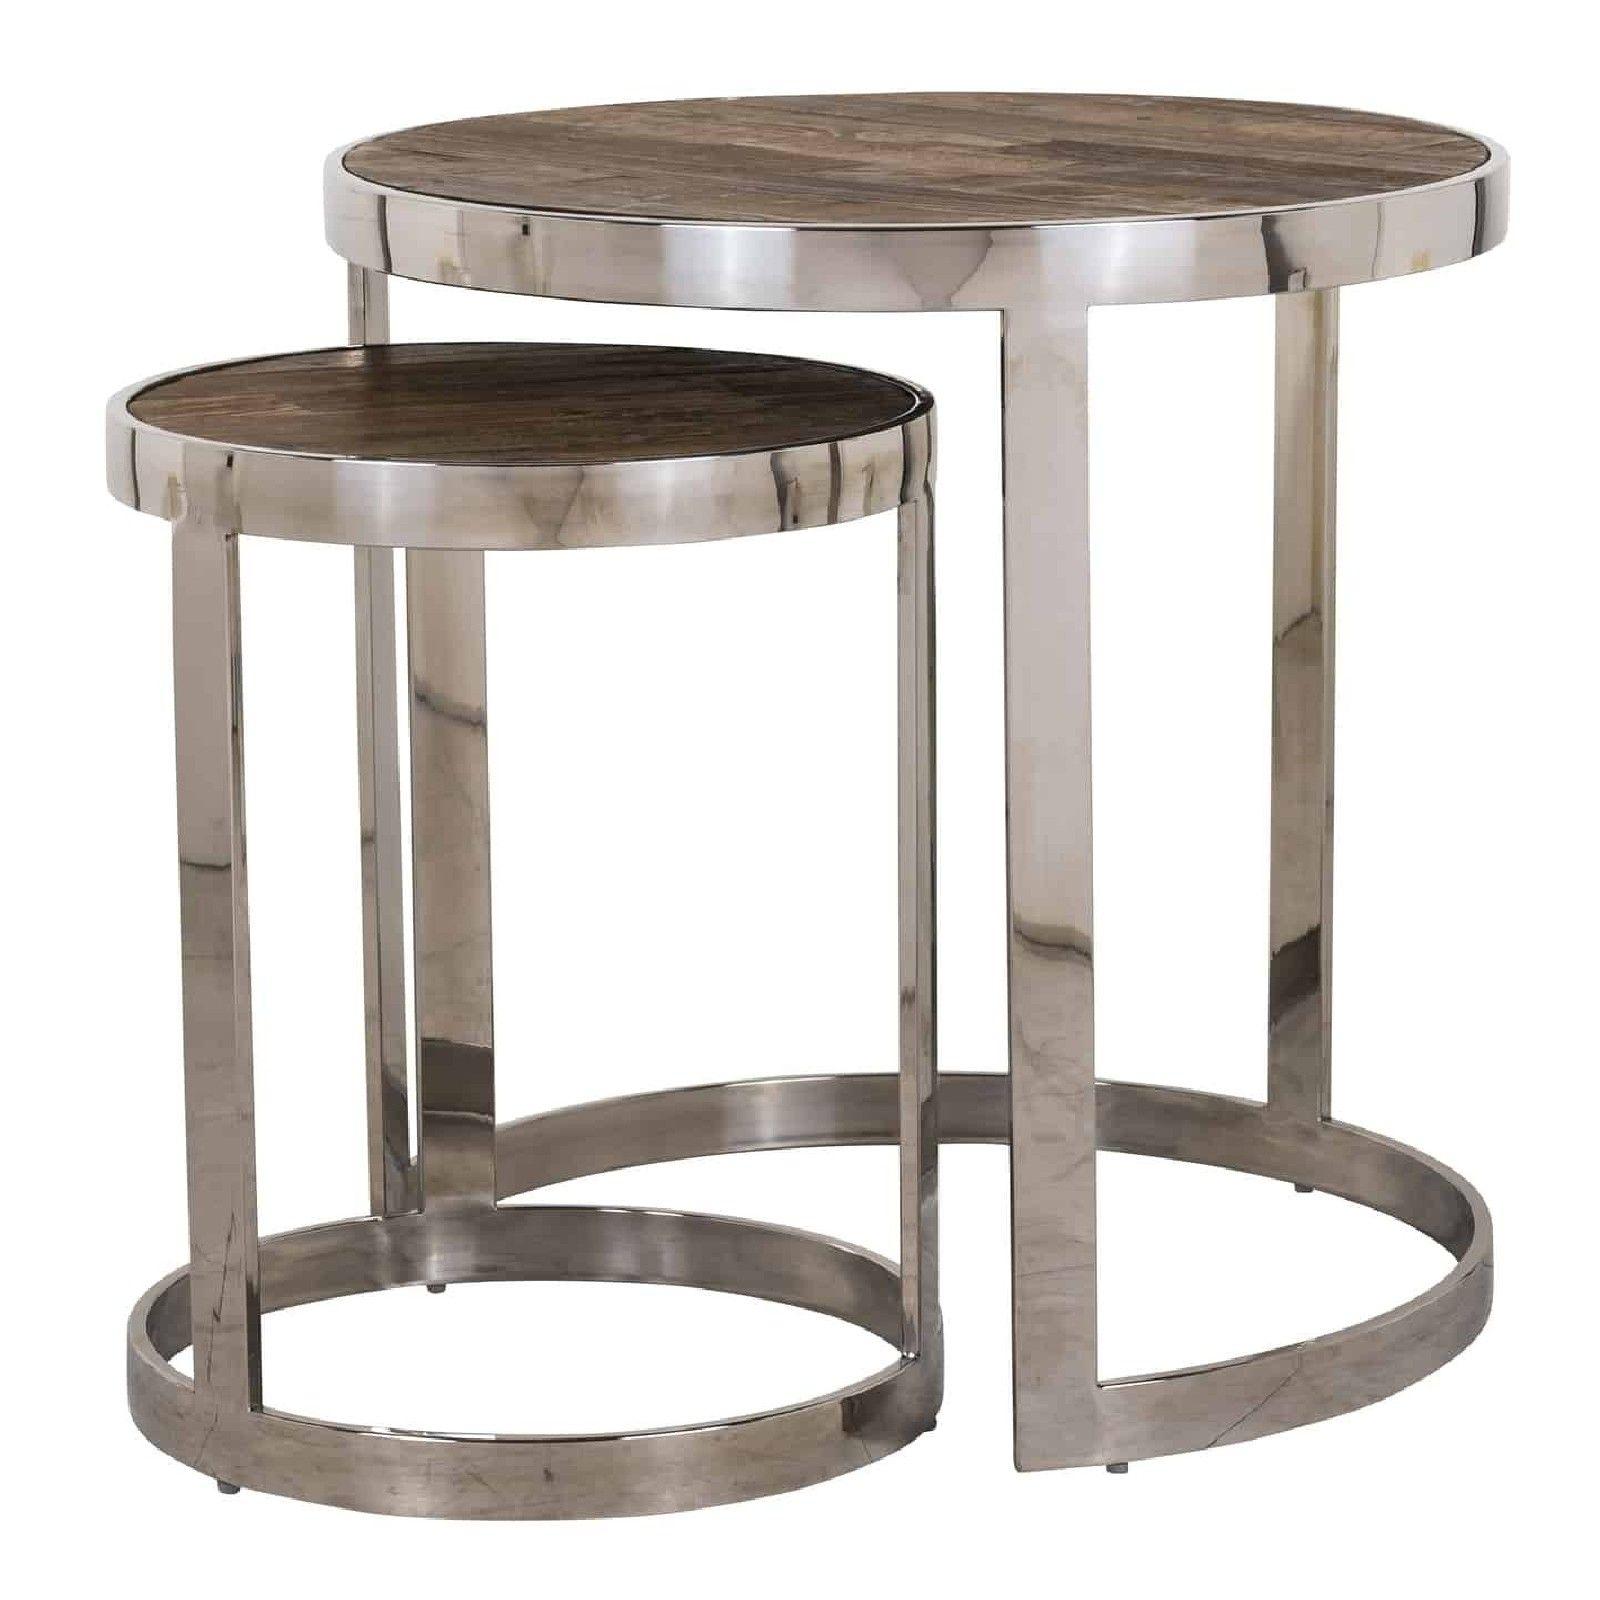 Table d'angle Redmond / Maddox set de 2 rond Meuble Déco Tendance - 154